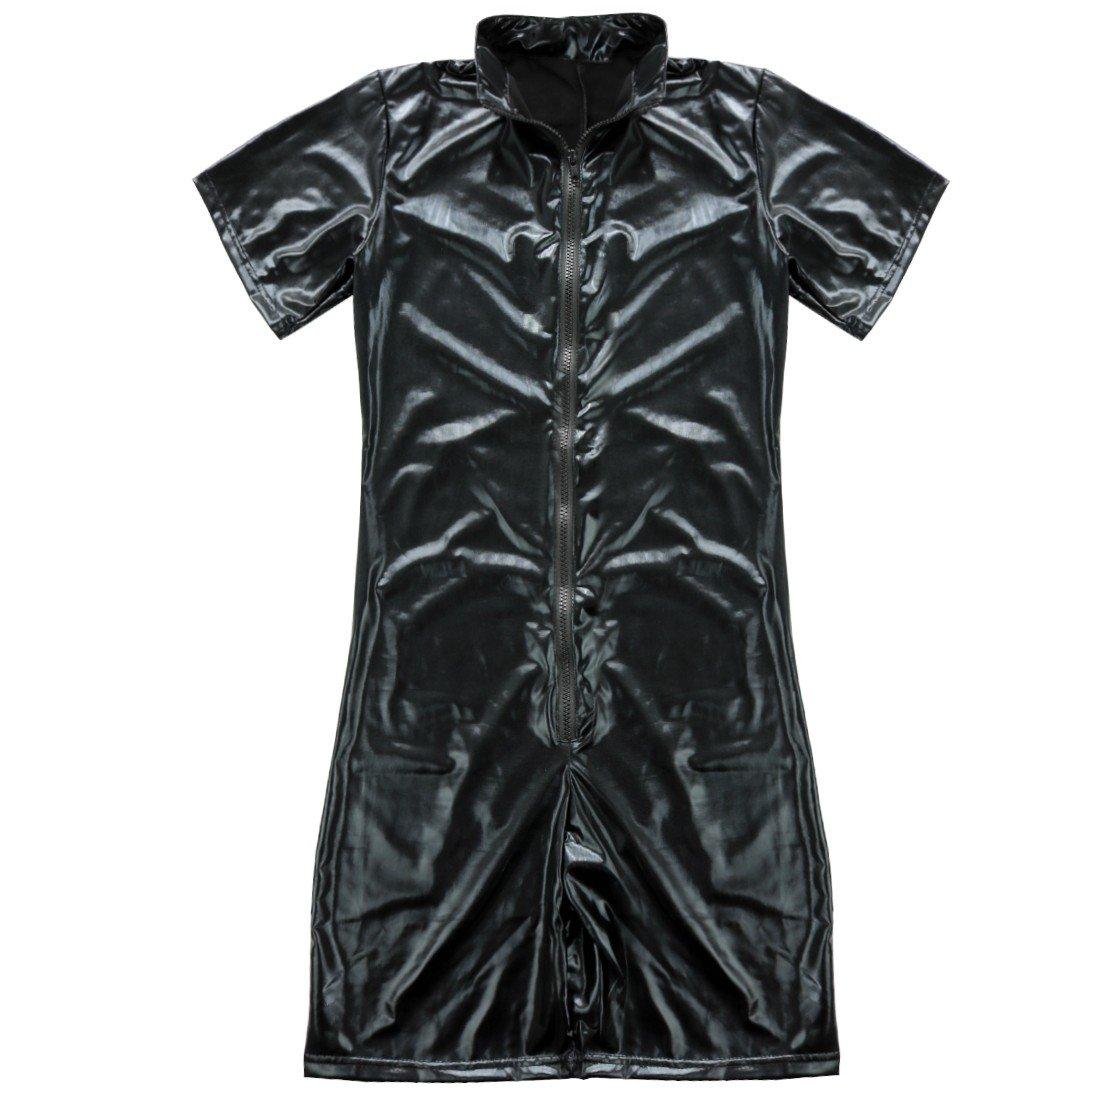 c8817fd52cb Amazon.com  iEFiEL Men Patent Leather Romper Bodysuit Club Studio Stage  Catsuit Zipper Costume  Clothing